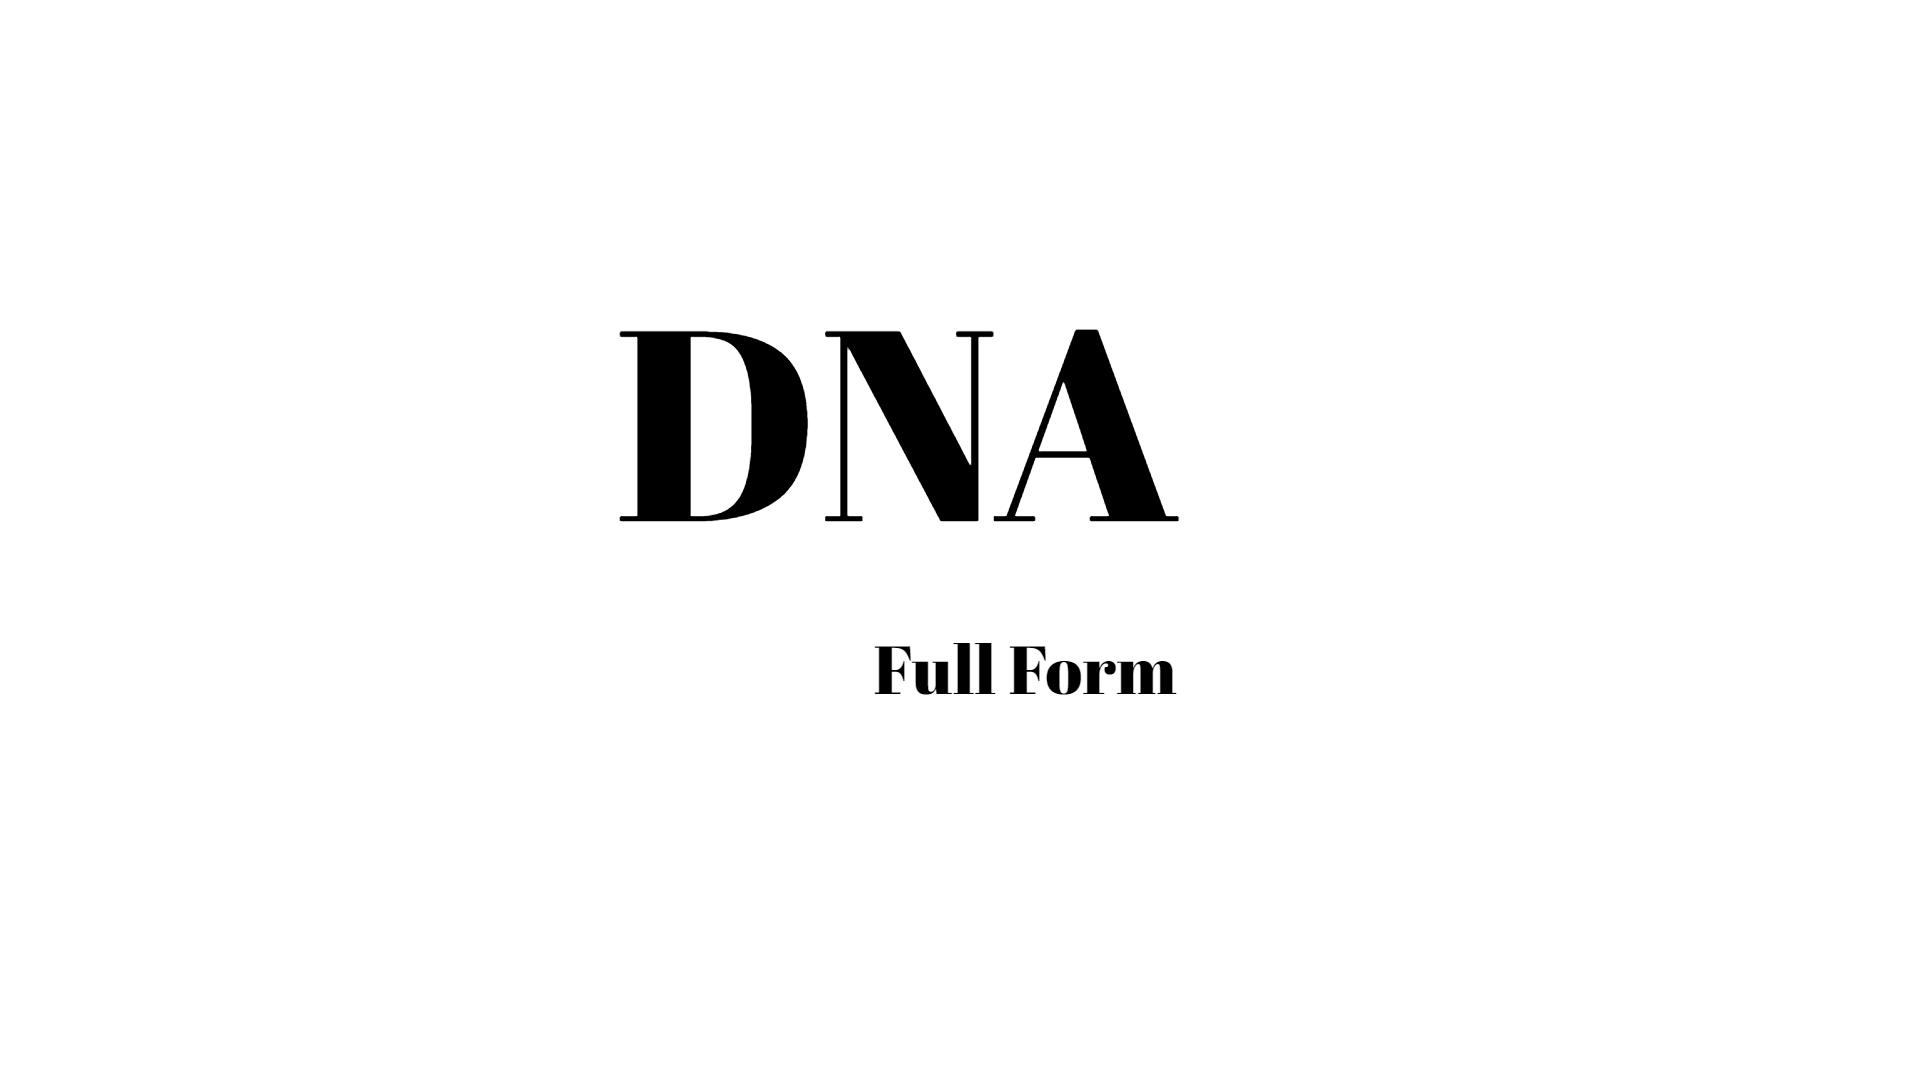 DNA full form